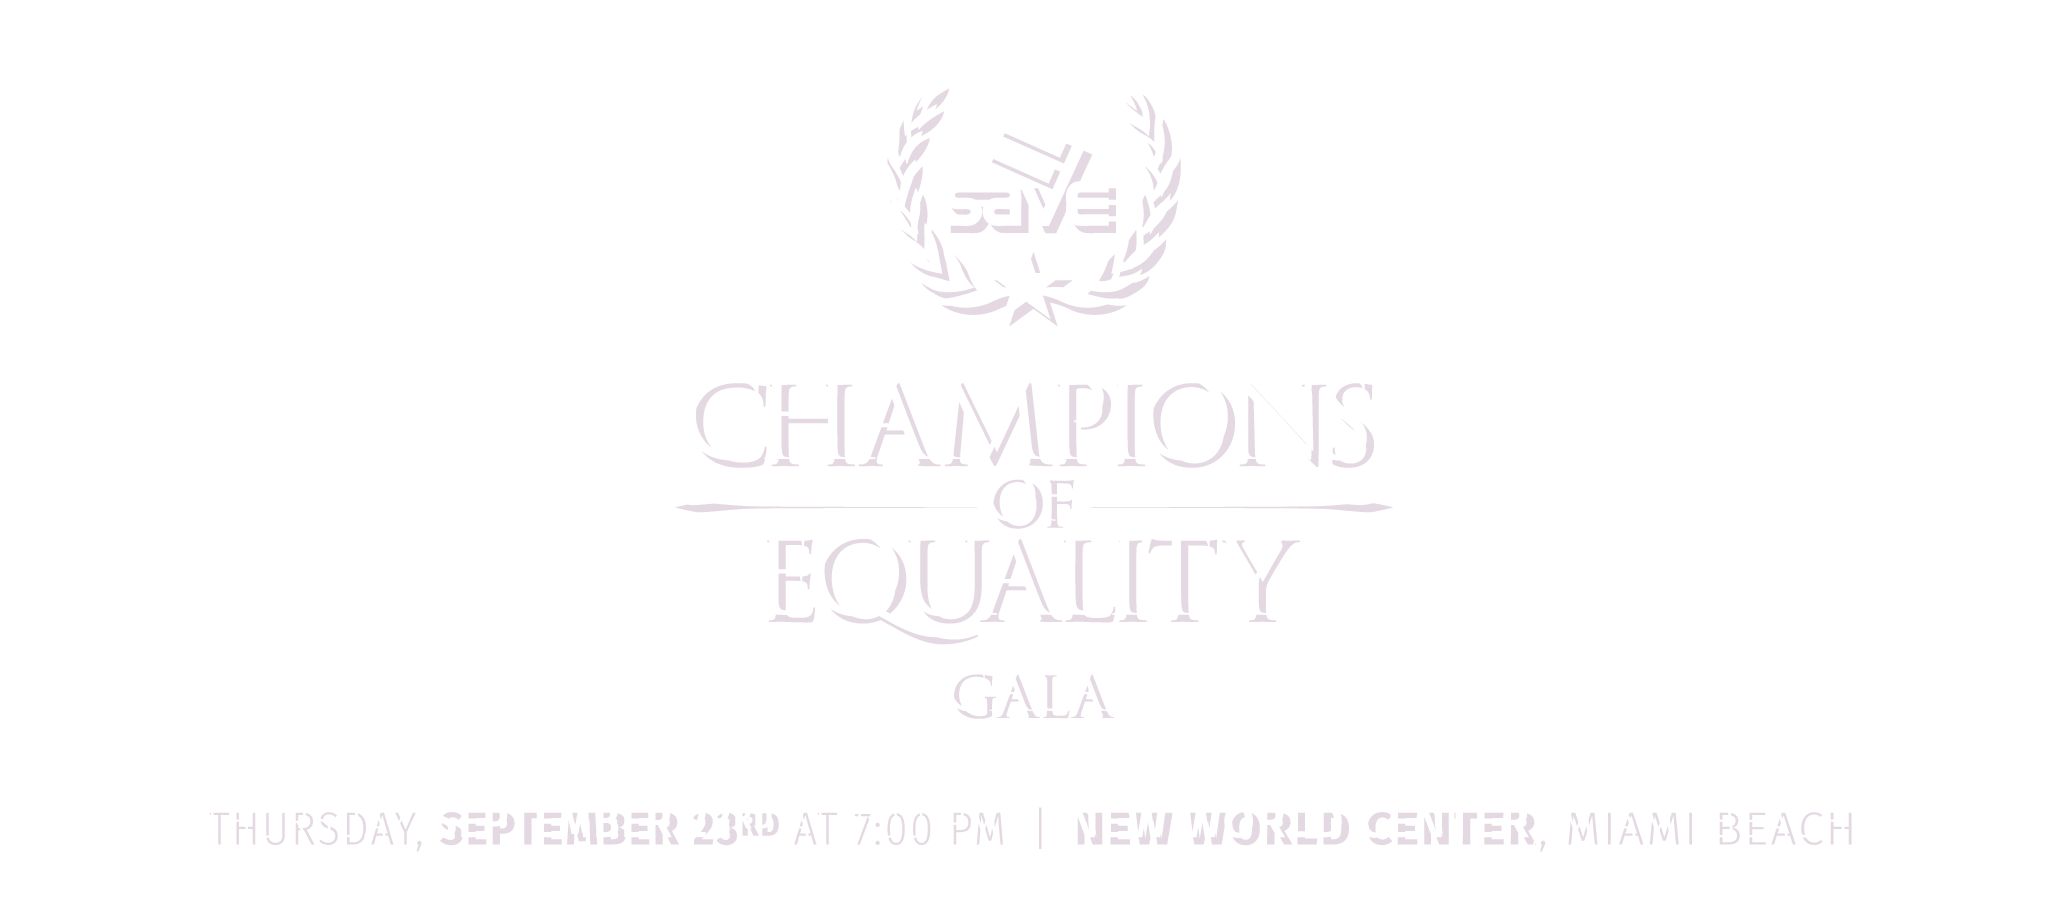 Champions of Equality Gala